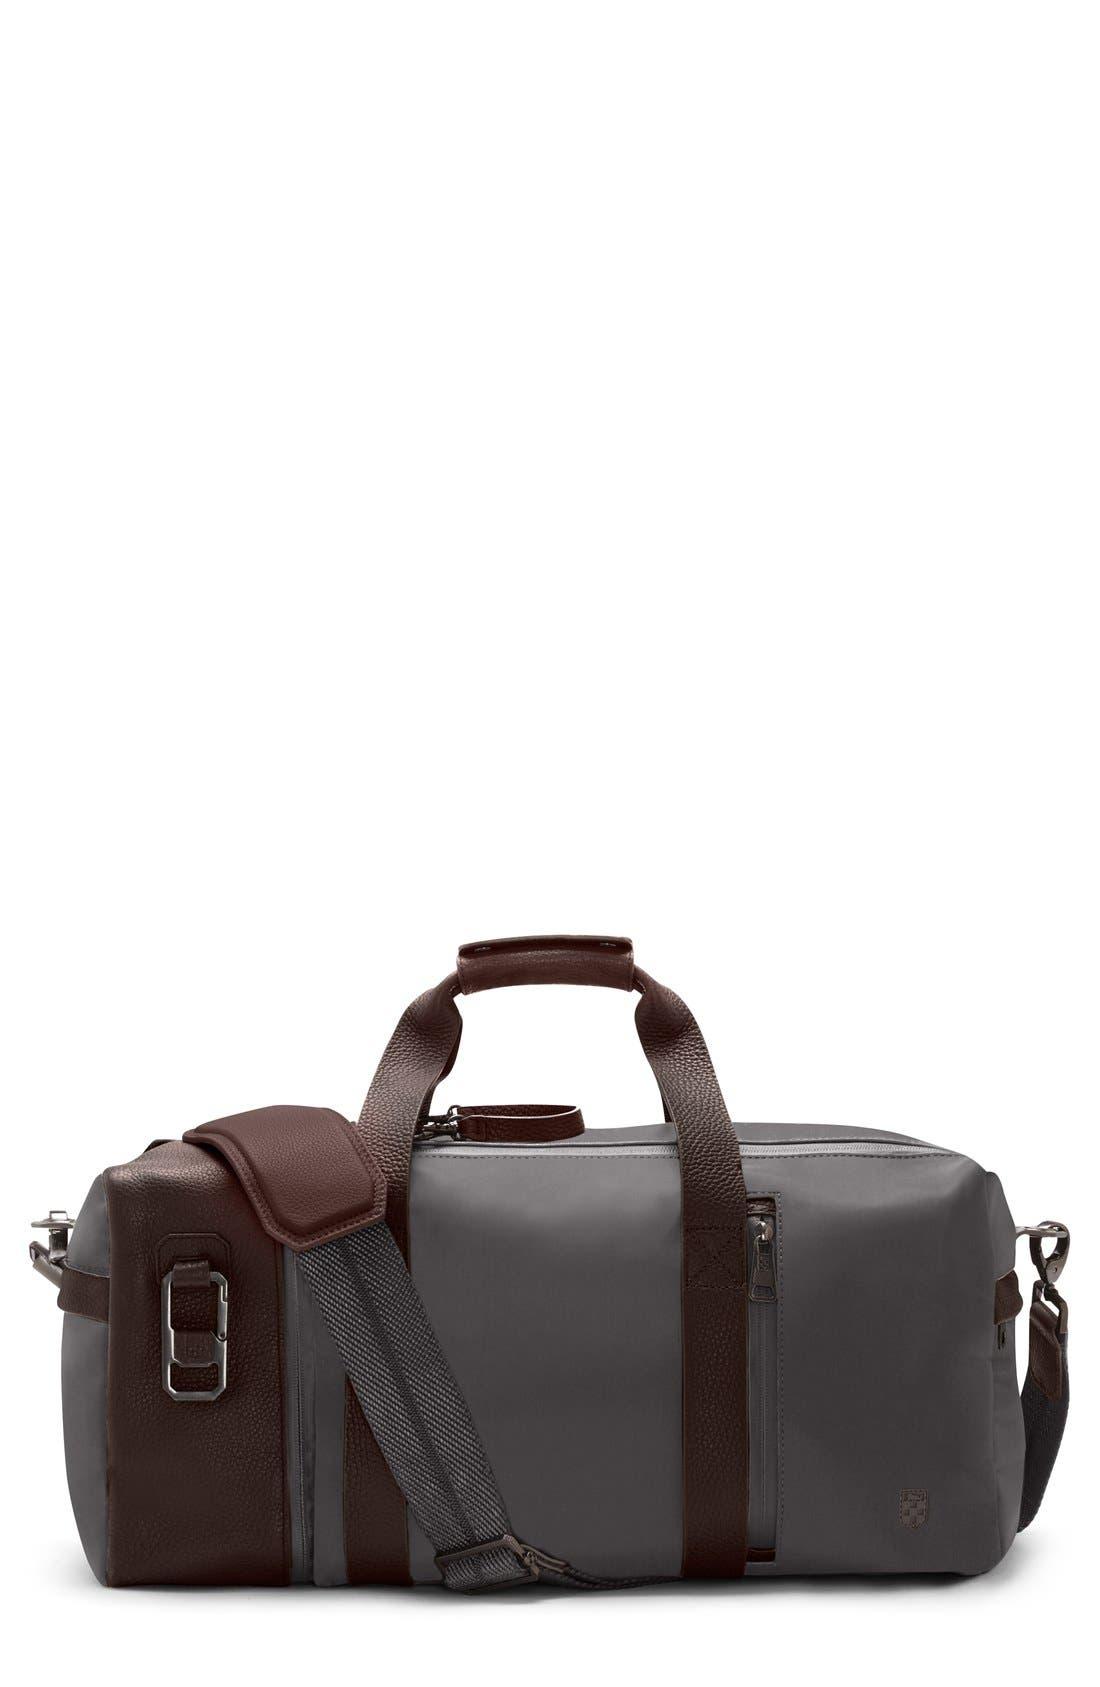 'Mestr' Duffel Bag,                             Main thumbnail 1, color,                             021